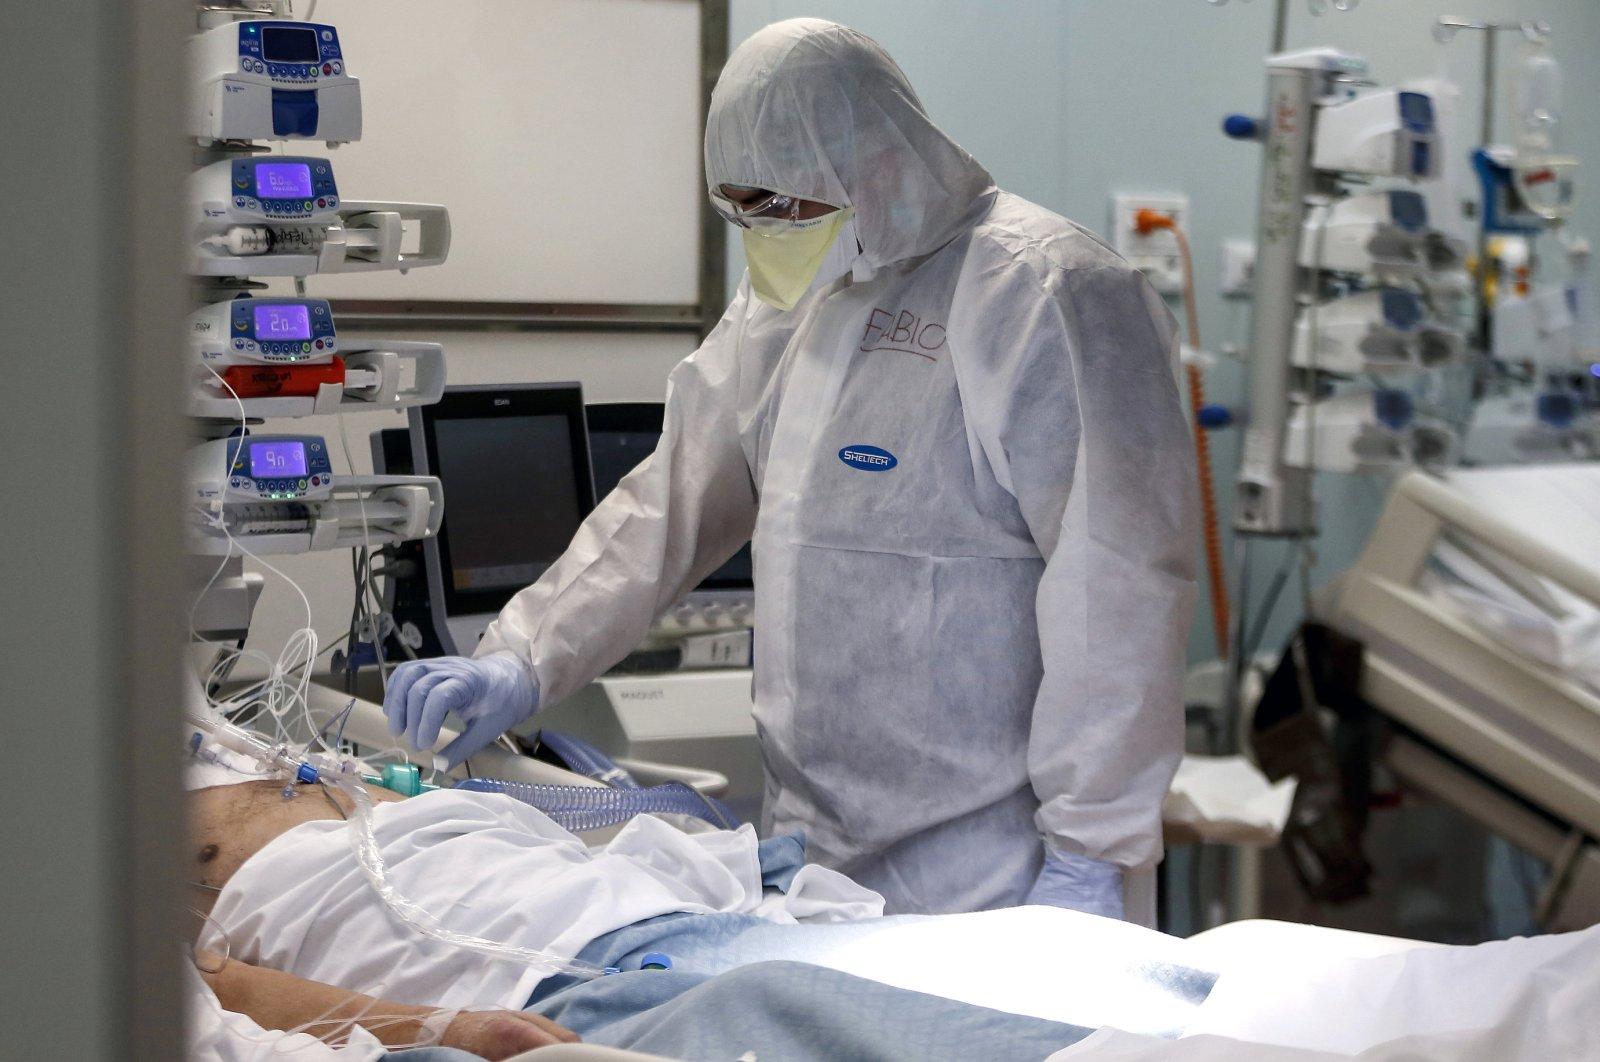 A medical staffer tends to a patient in the ICU unit of the Covid 3 hospital in Casalpalocco, near Rome, April 11, 2020. (Cecilia Fabiano/LaPresse via AP)